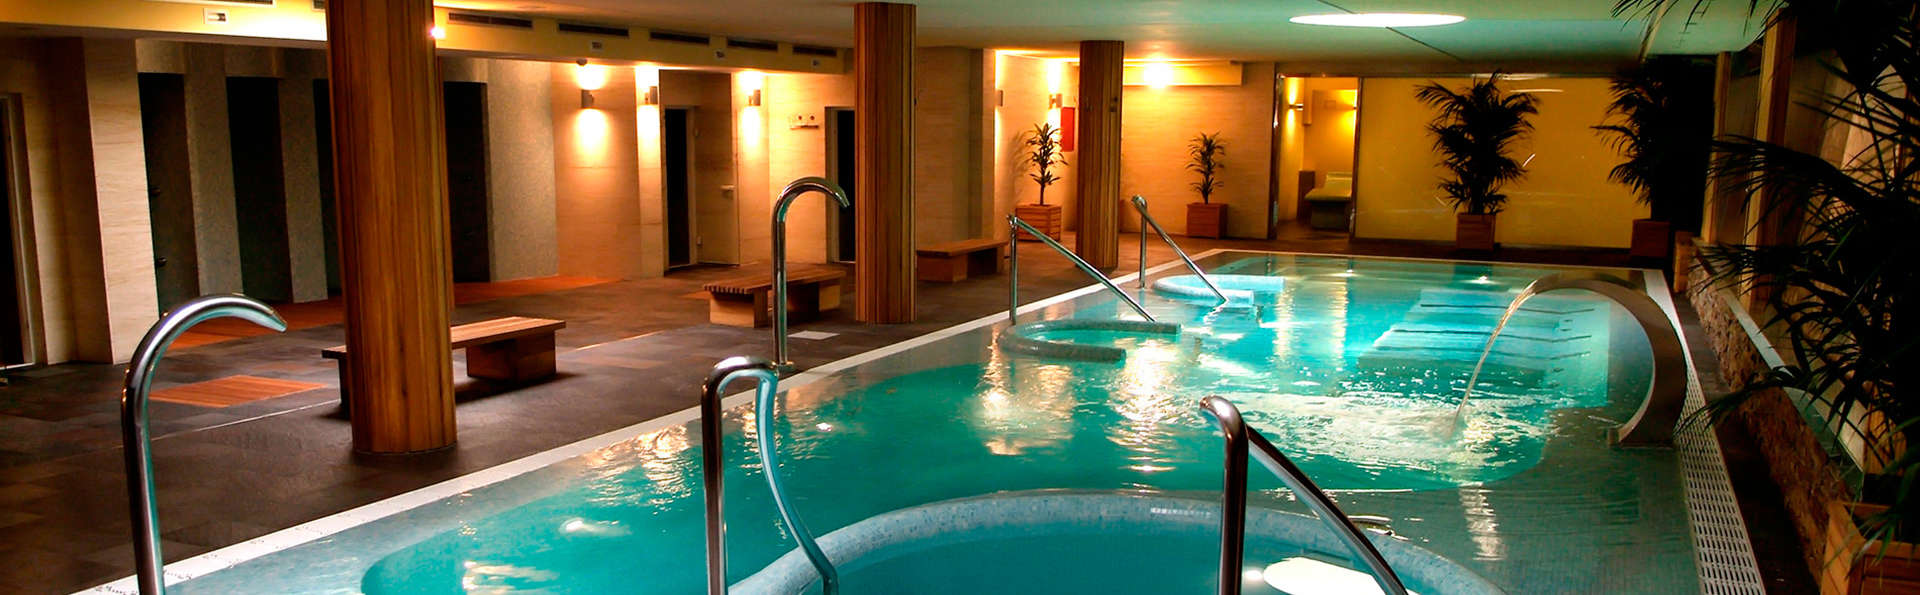 Poseidón La Manga Hotel & Spa (Adults Only) - EDIT_spa7.jpg